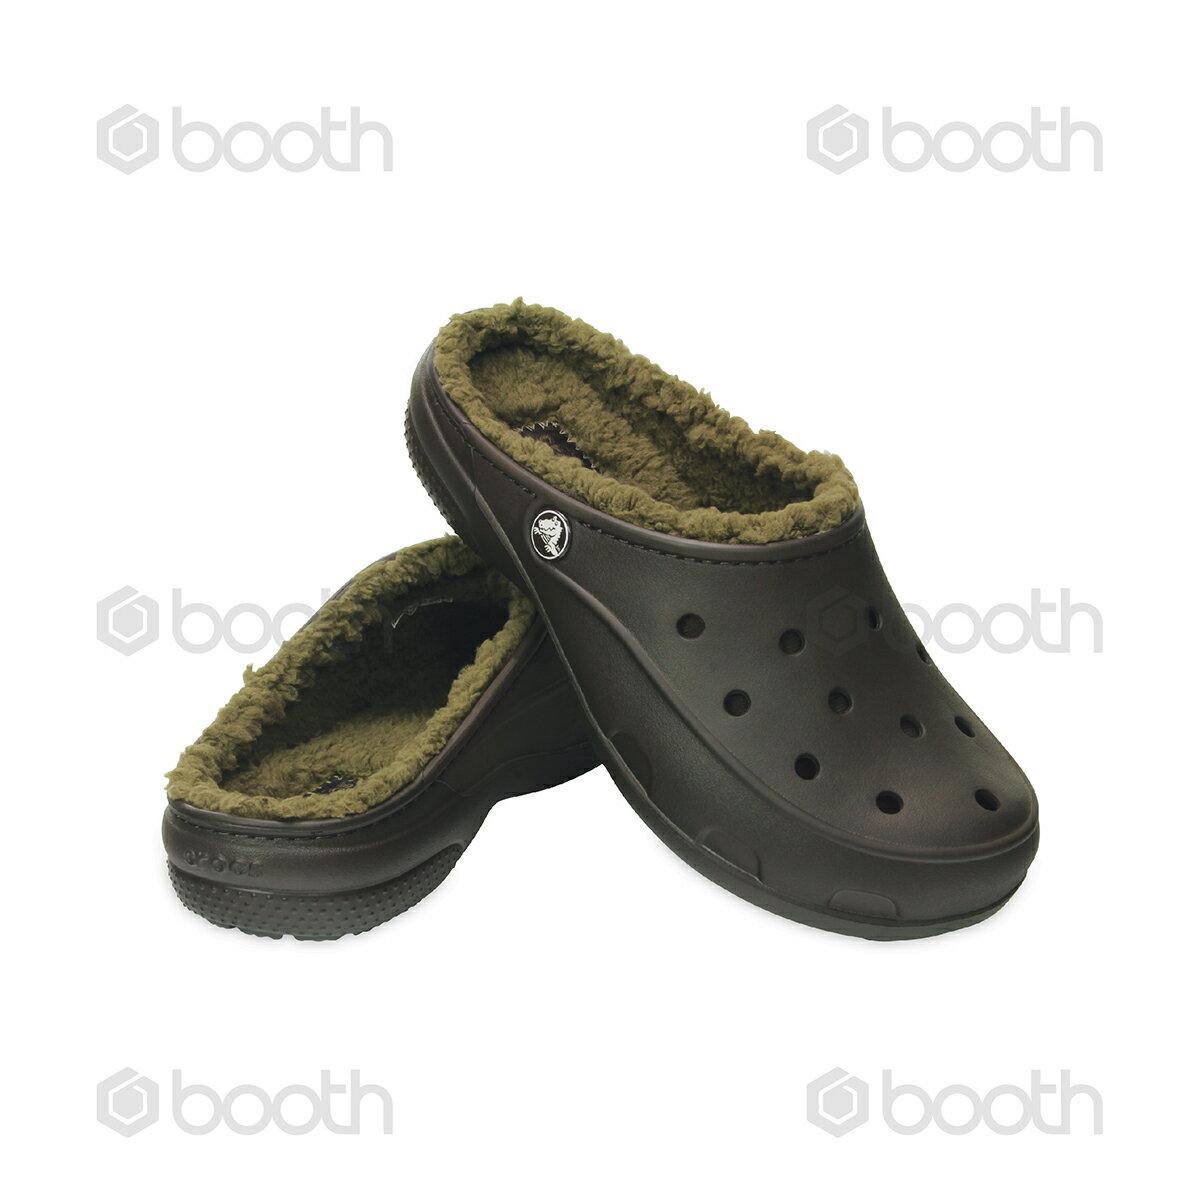 【SALE!!!】crocs freesail ...の商品画像